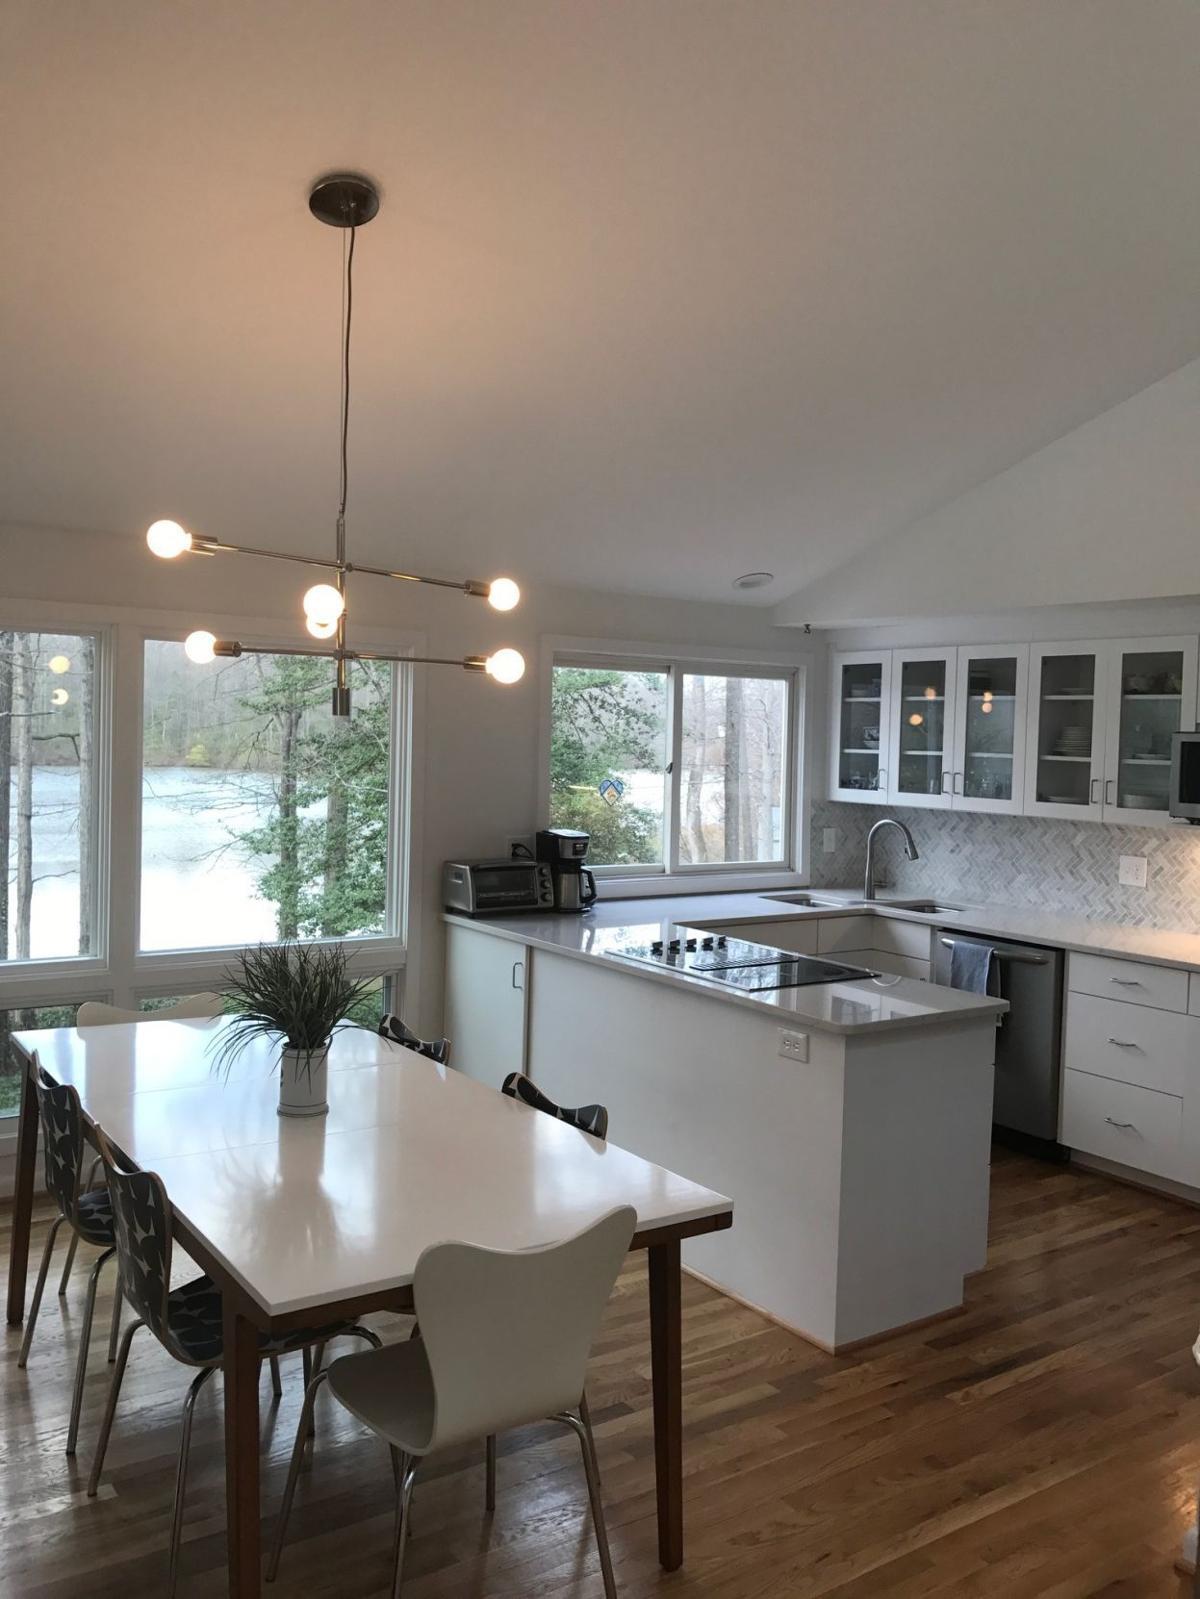 Discover Richmond: Kitchen trends